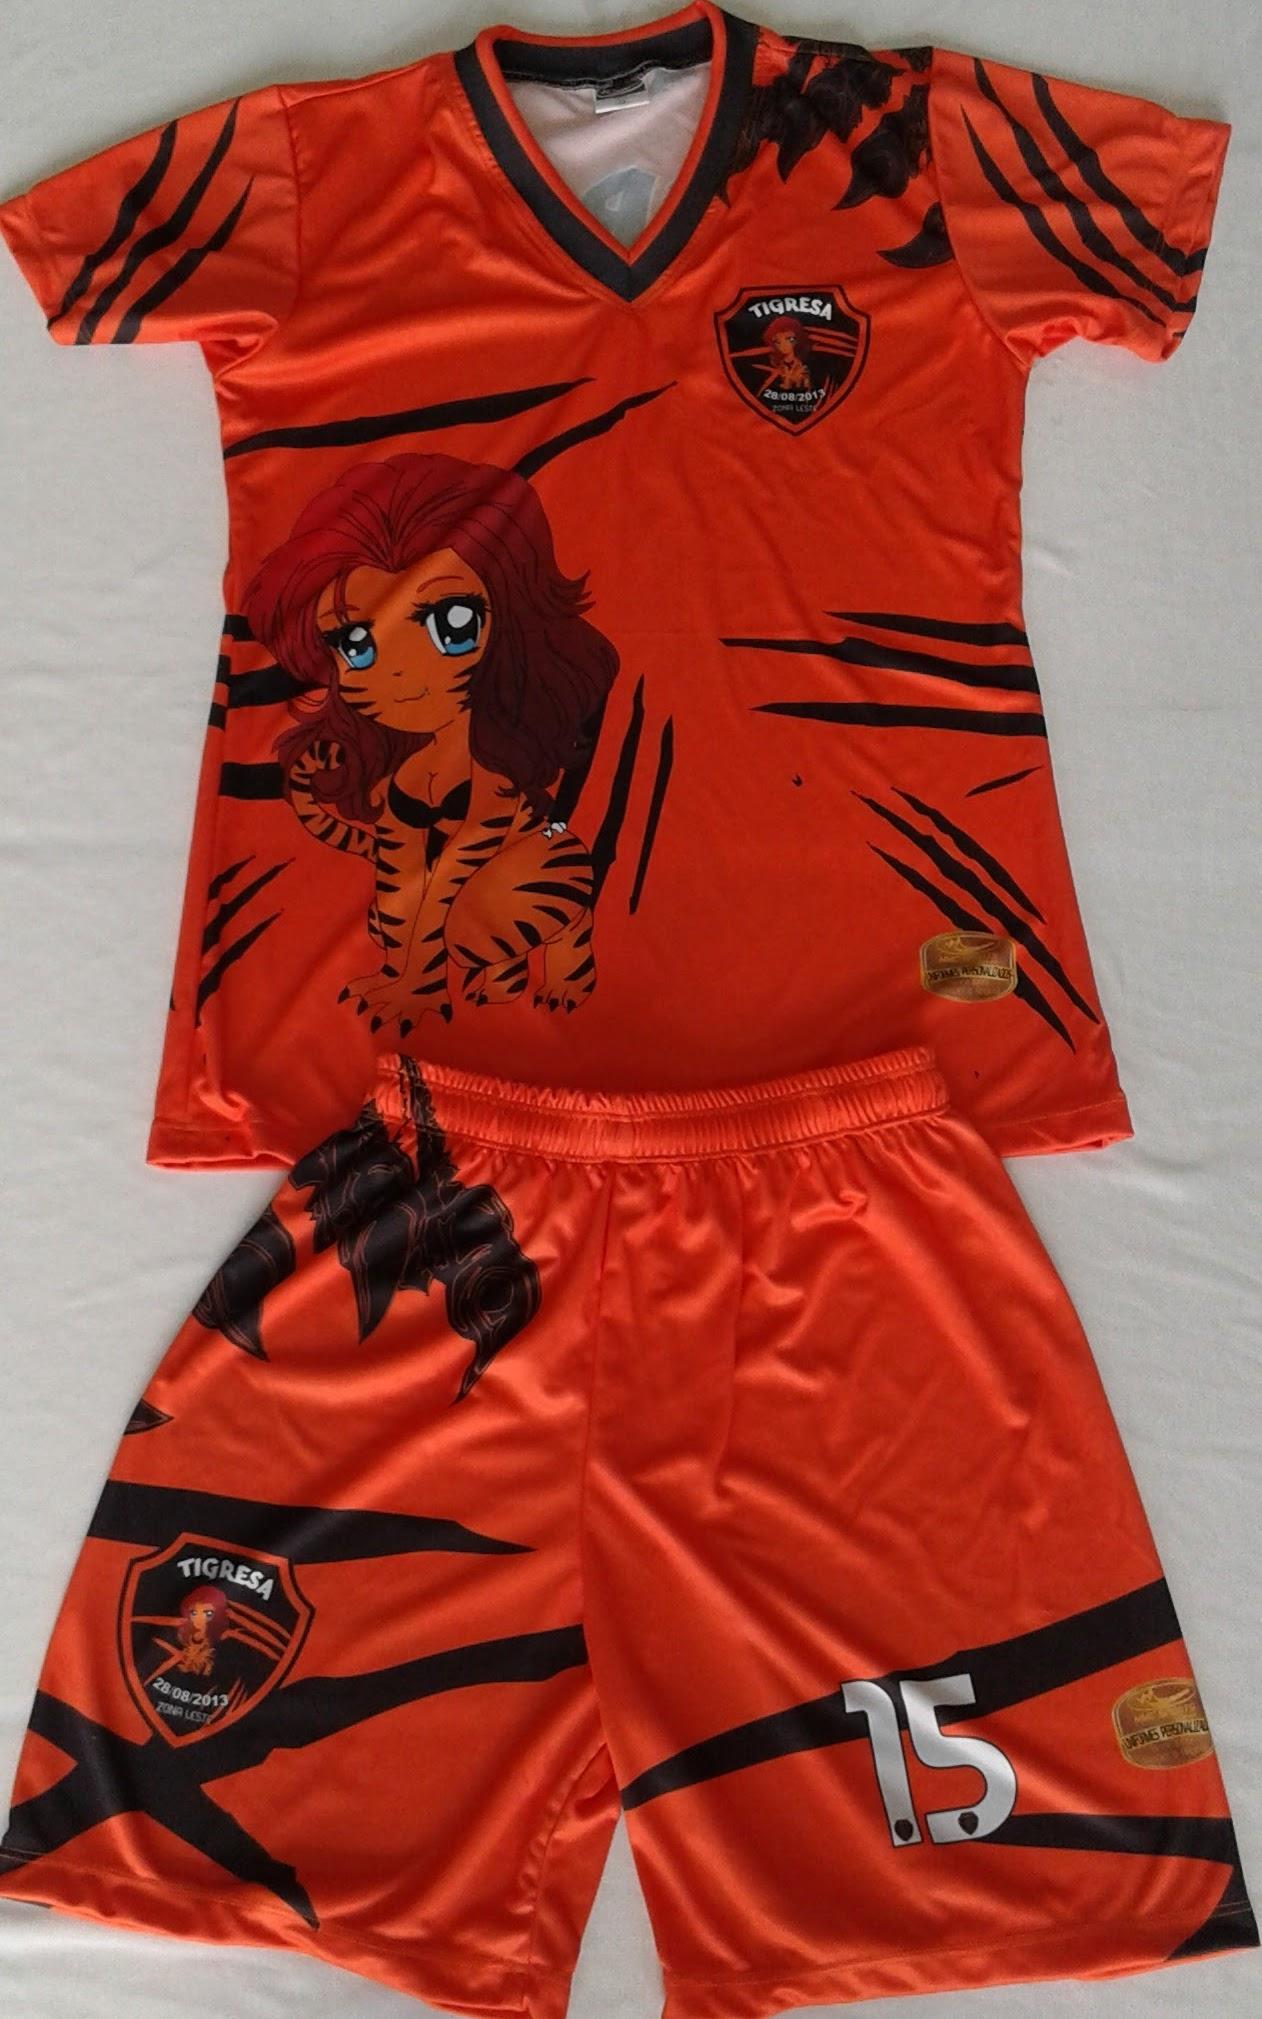 993530d23bd64 Fardamentos para futebol feminino Tigresas Futsal